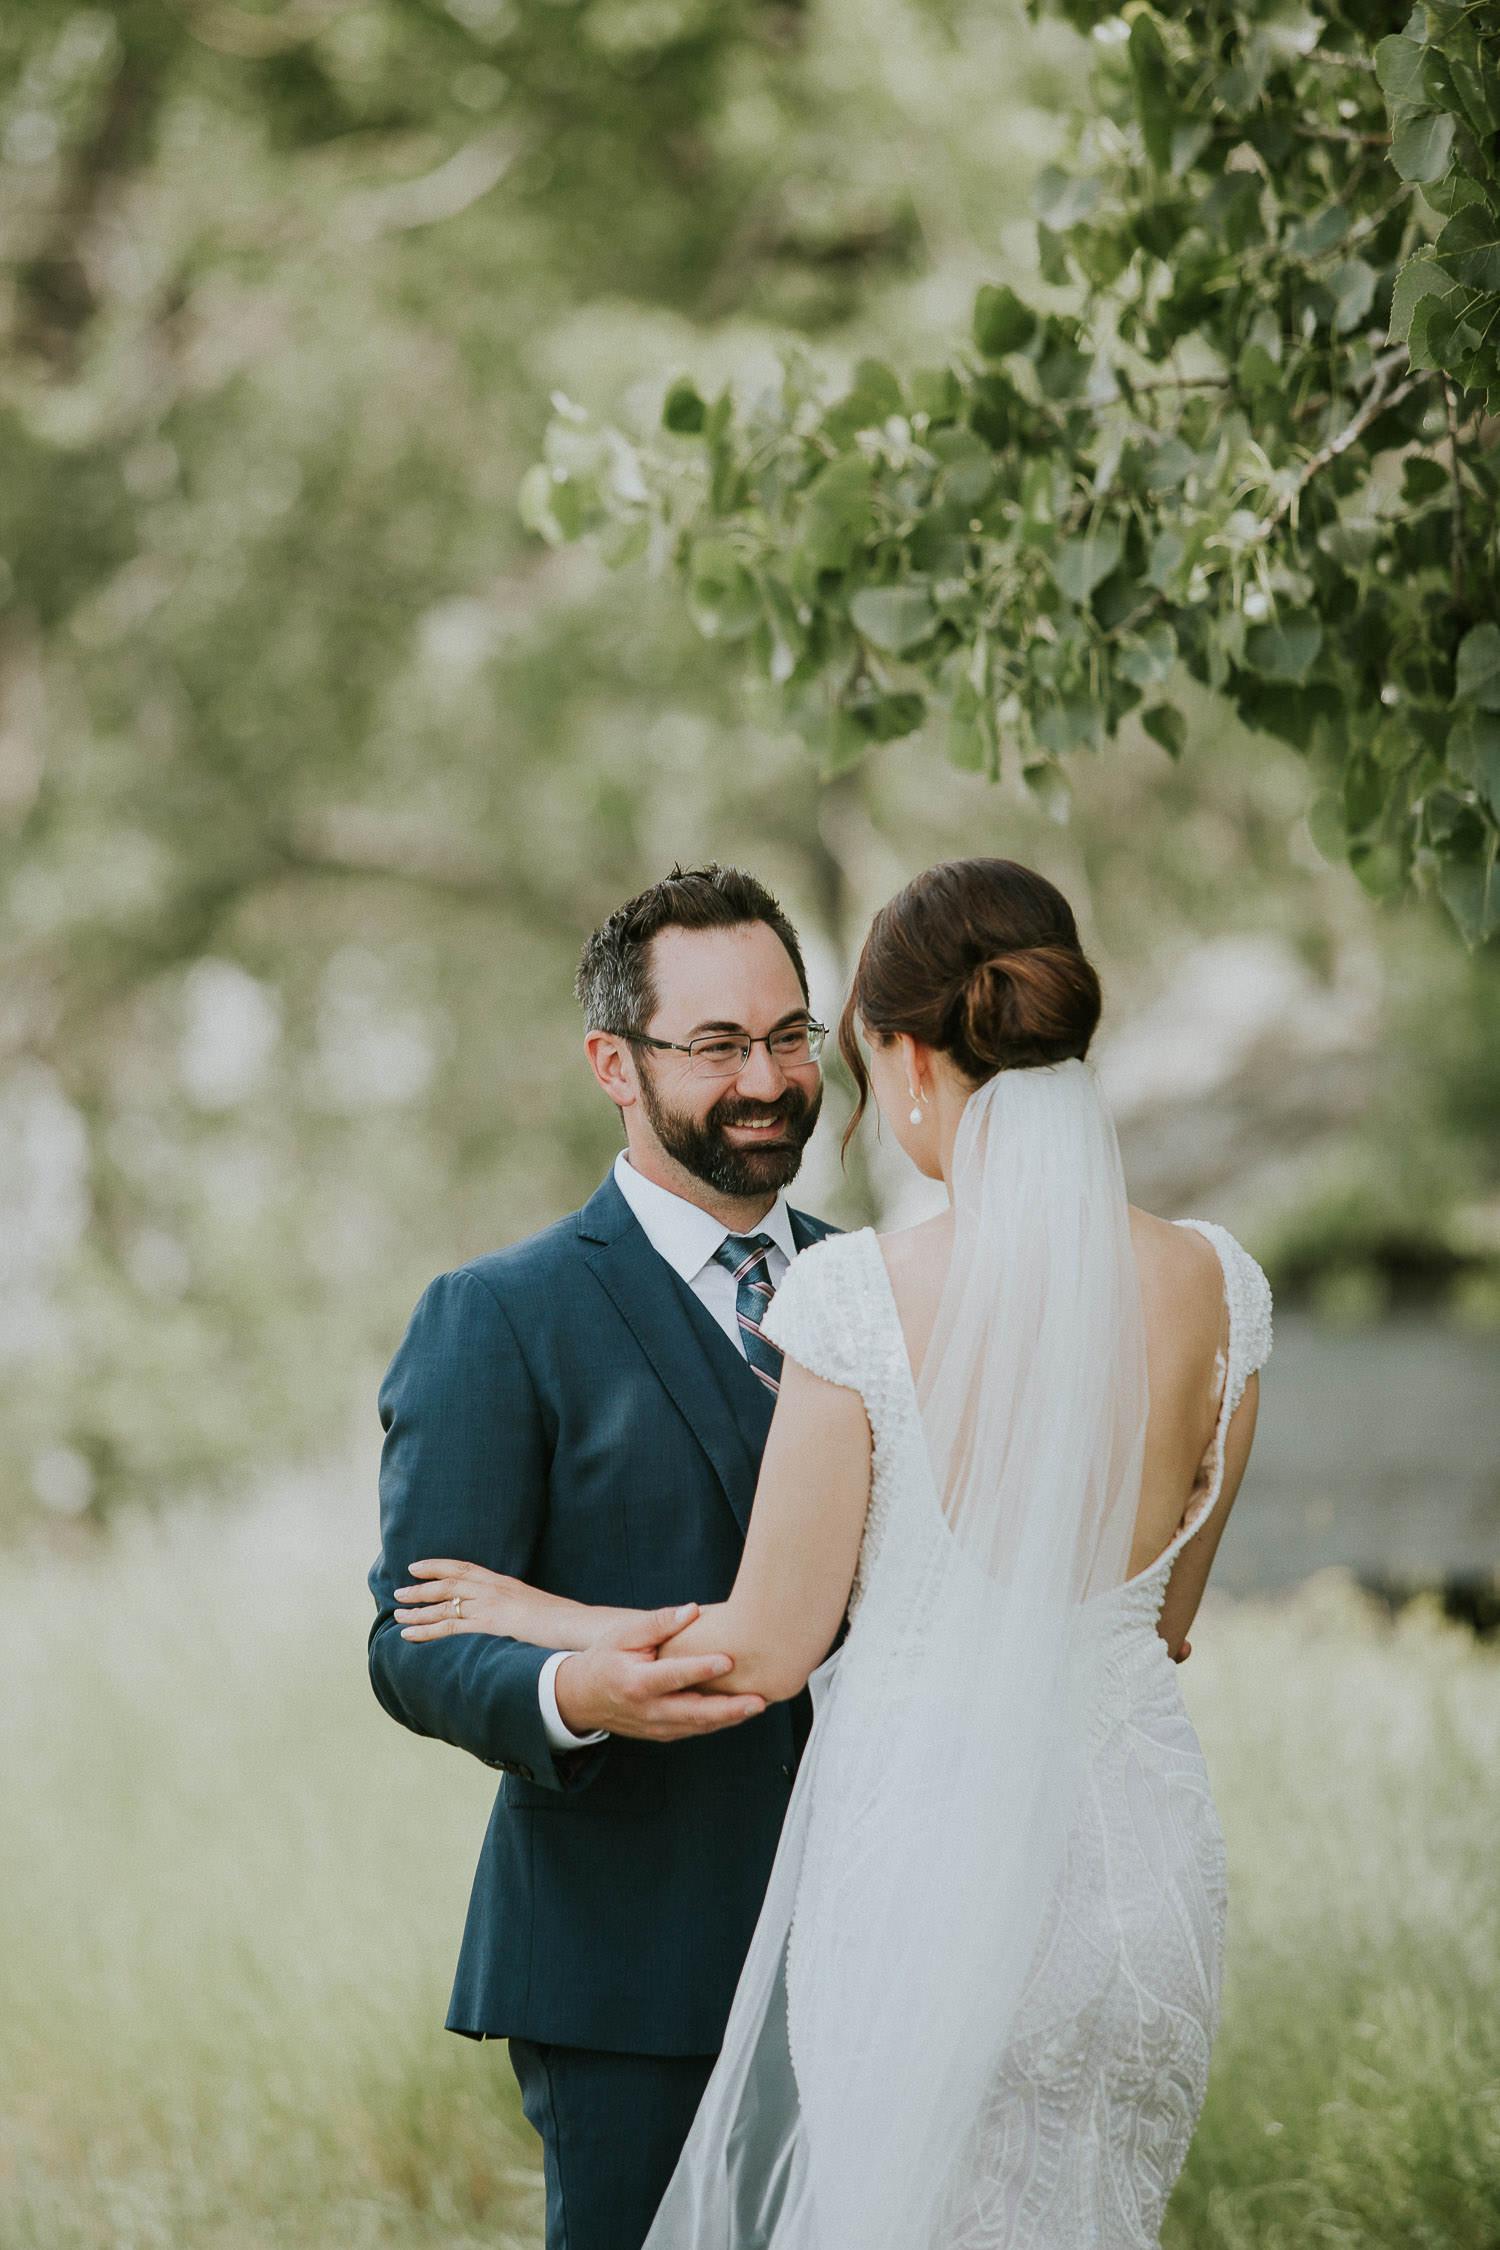 summer-backyard-wedding-in-alberta-sarah-pukin-0049